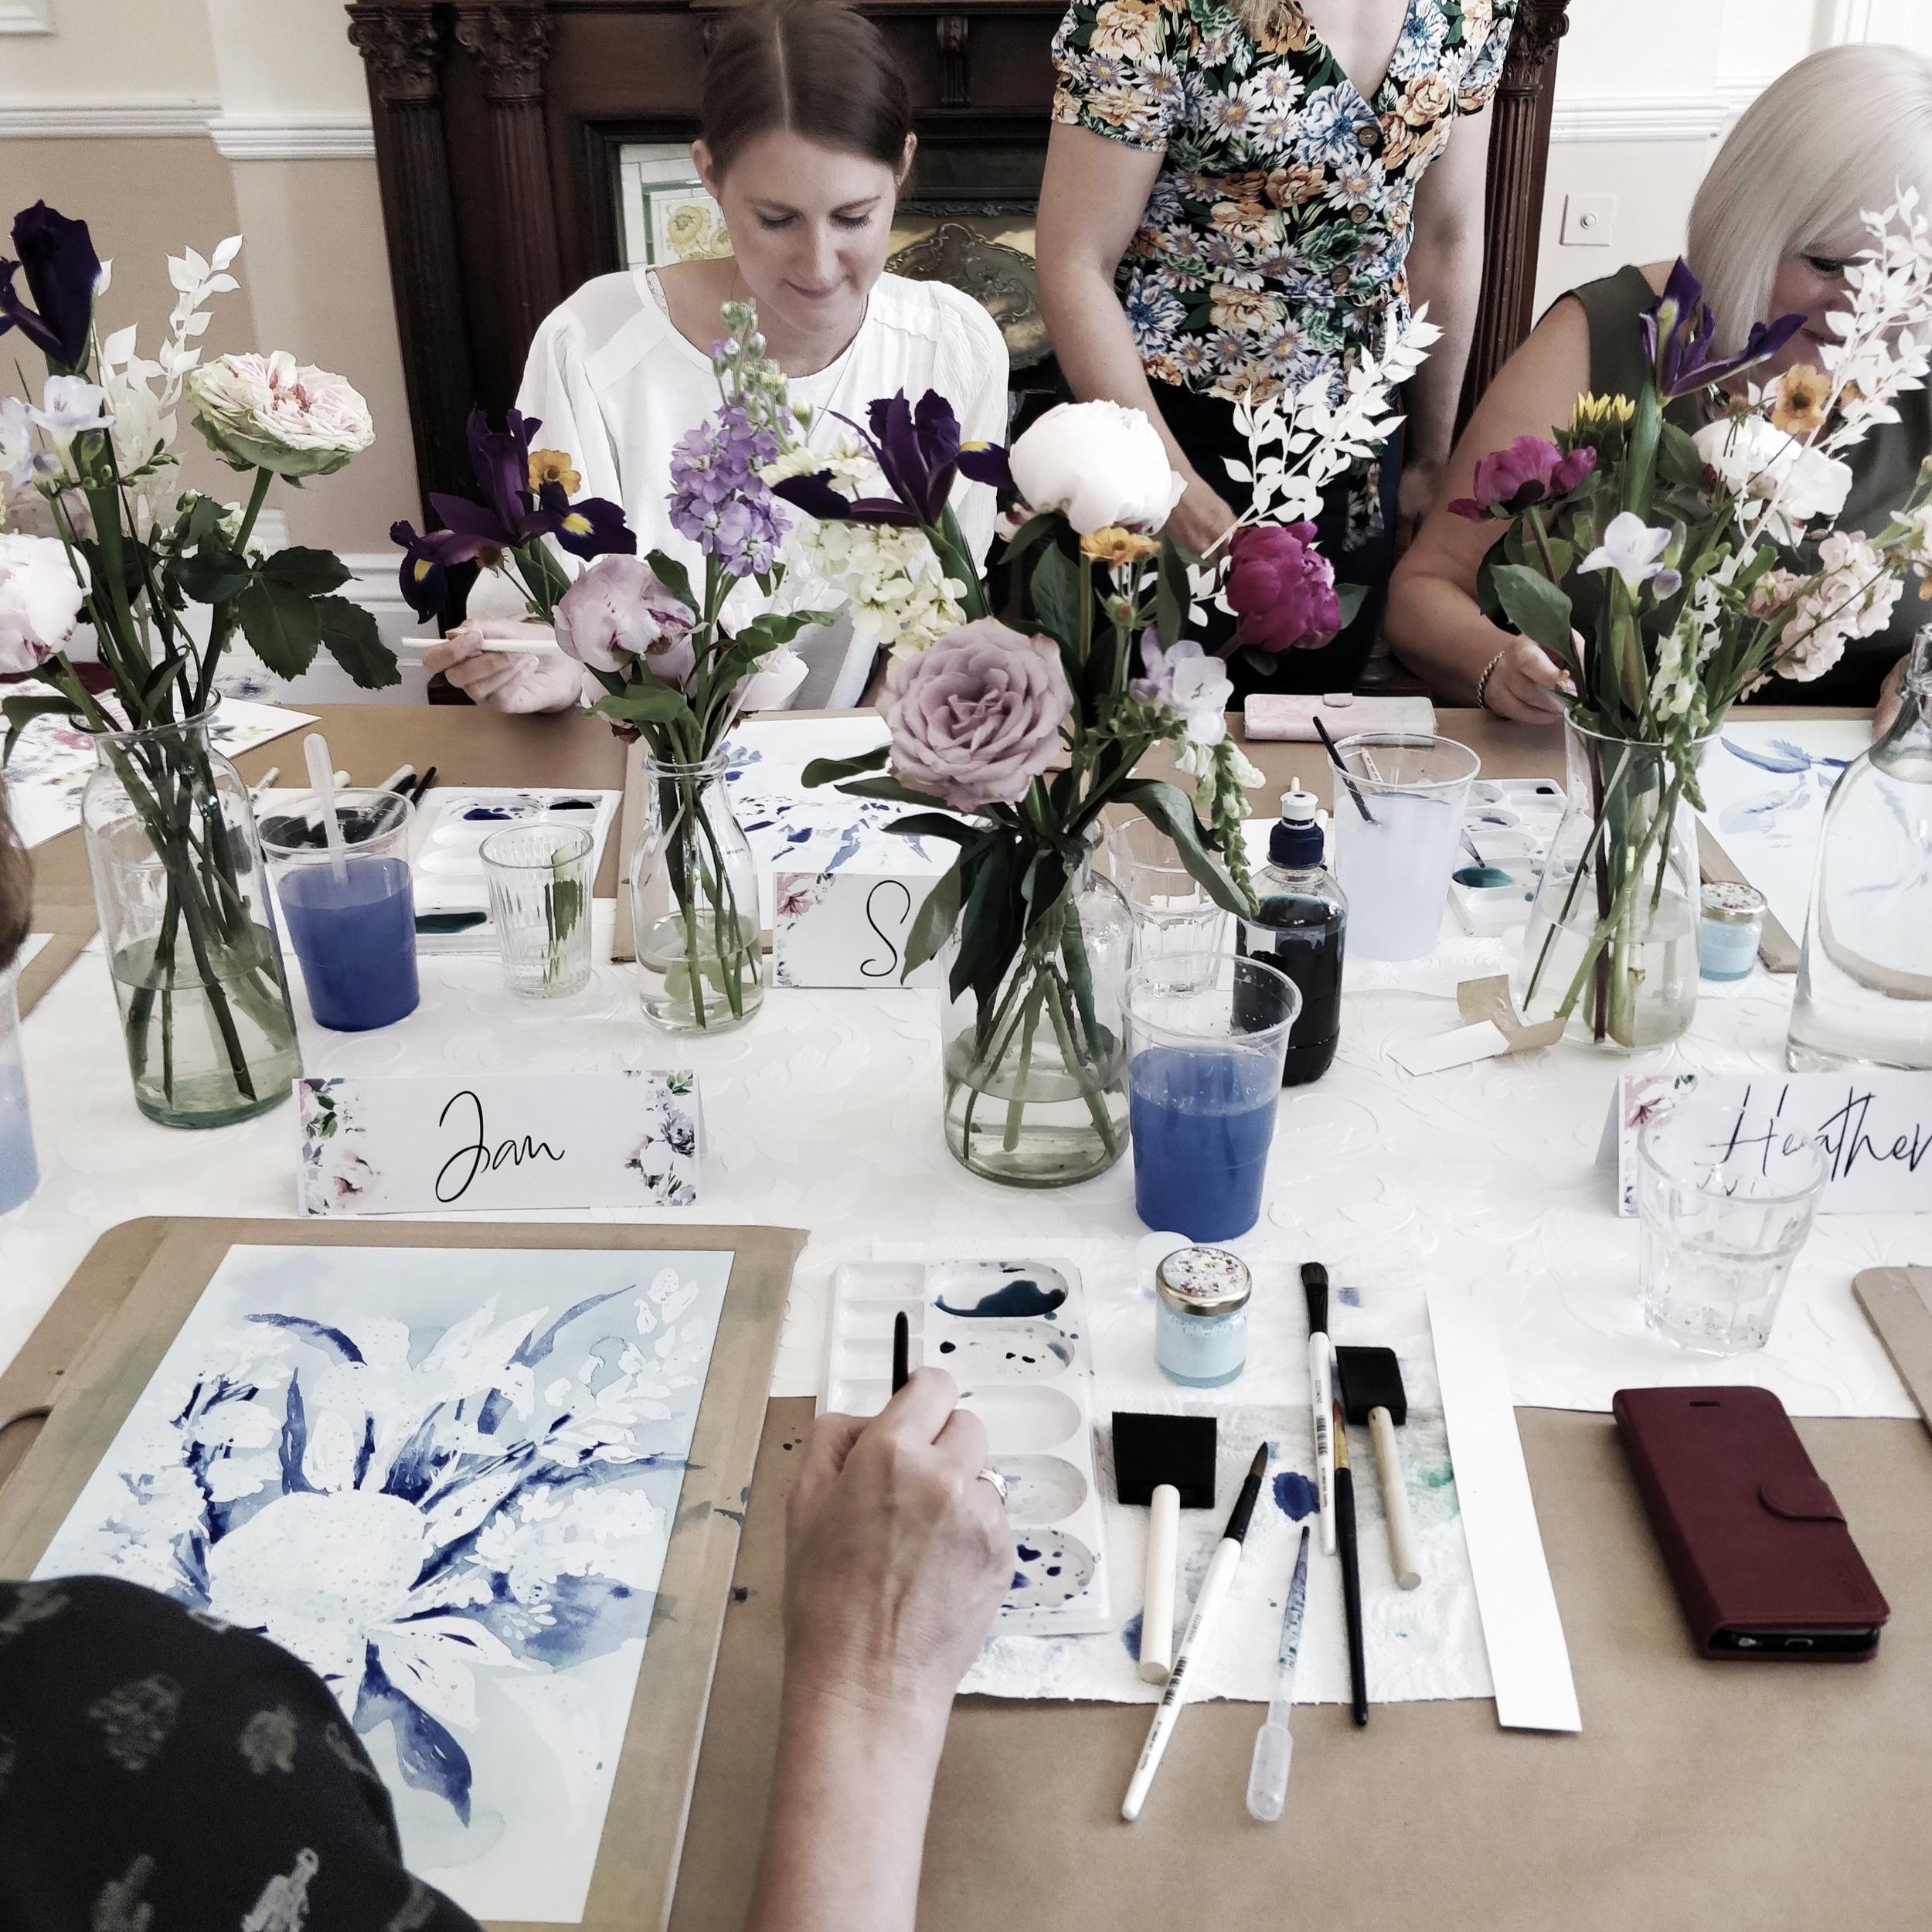 jess+priest+watercolour+workshop.jpg